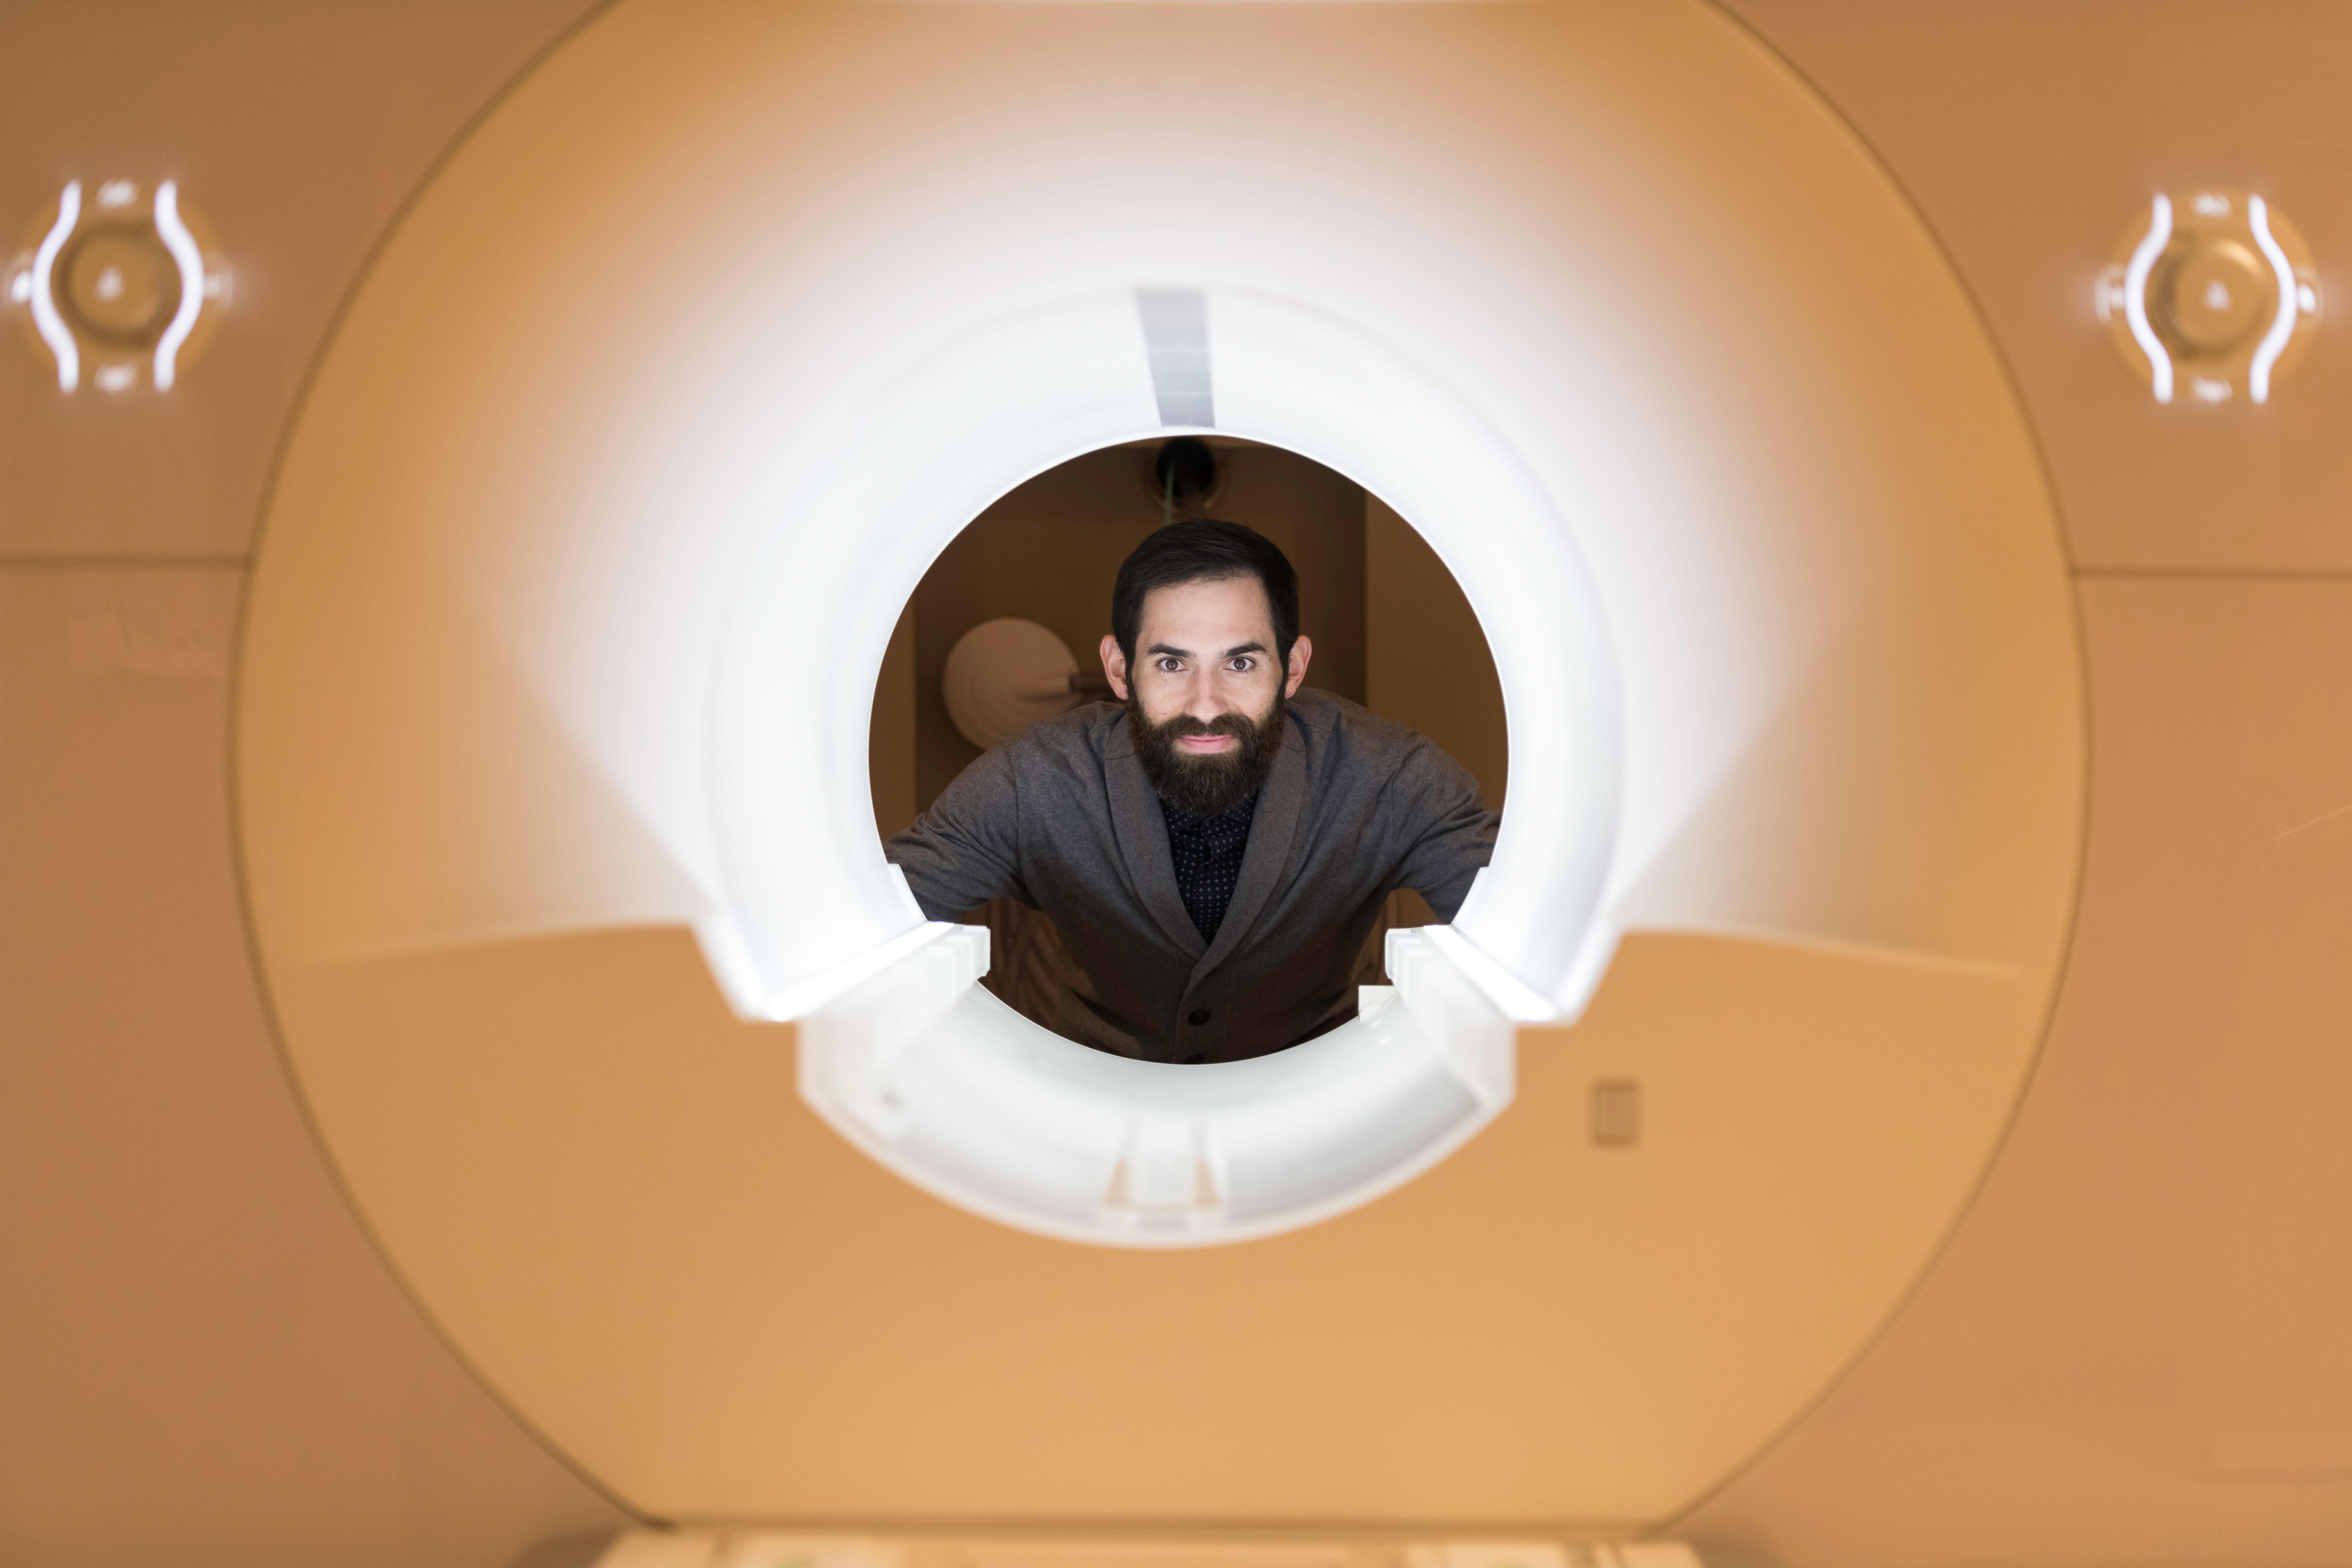 David Dodell-Feder in MRI